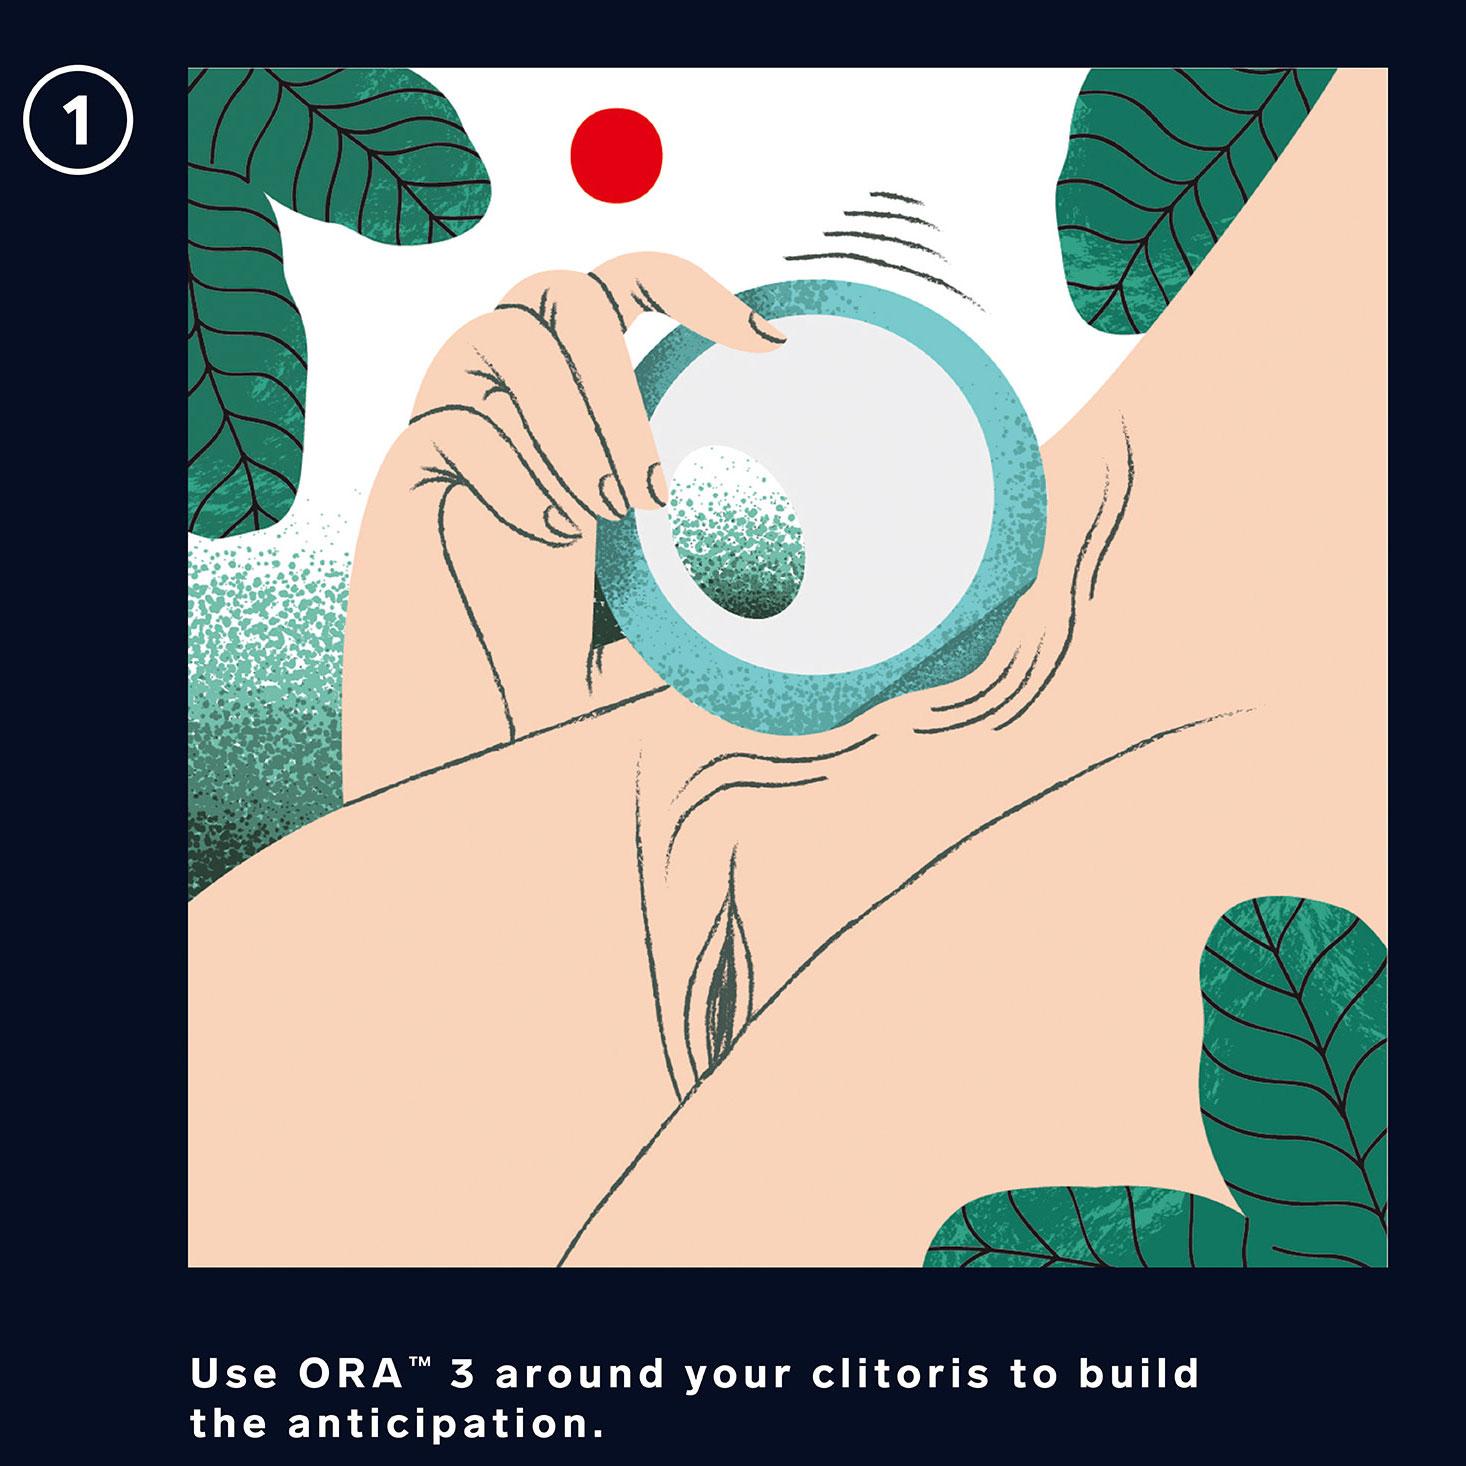 LELO ORA 3 Vibrating Rotating Oral Sex Stimulator - How To 1